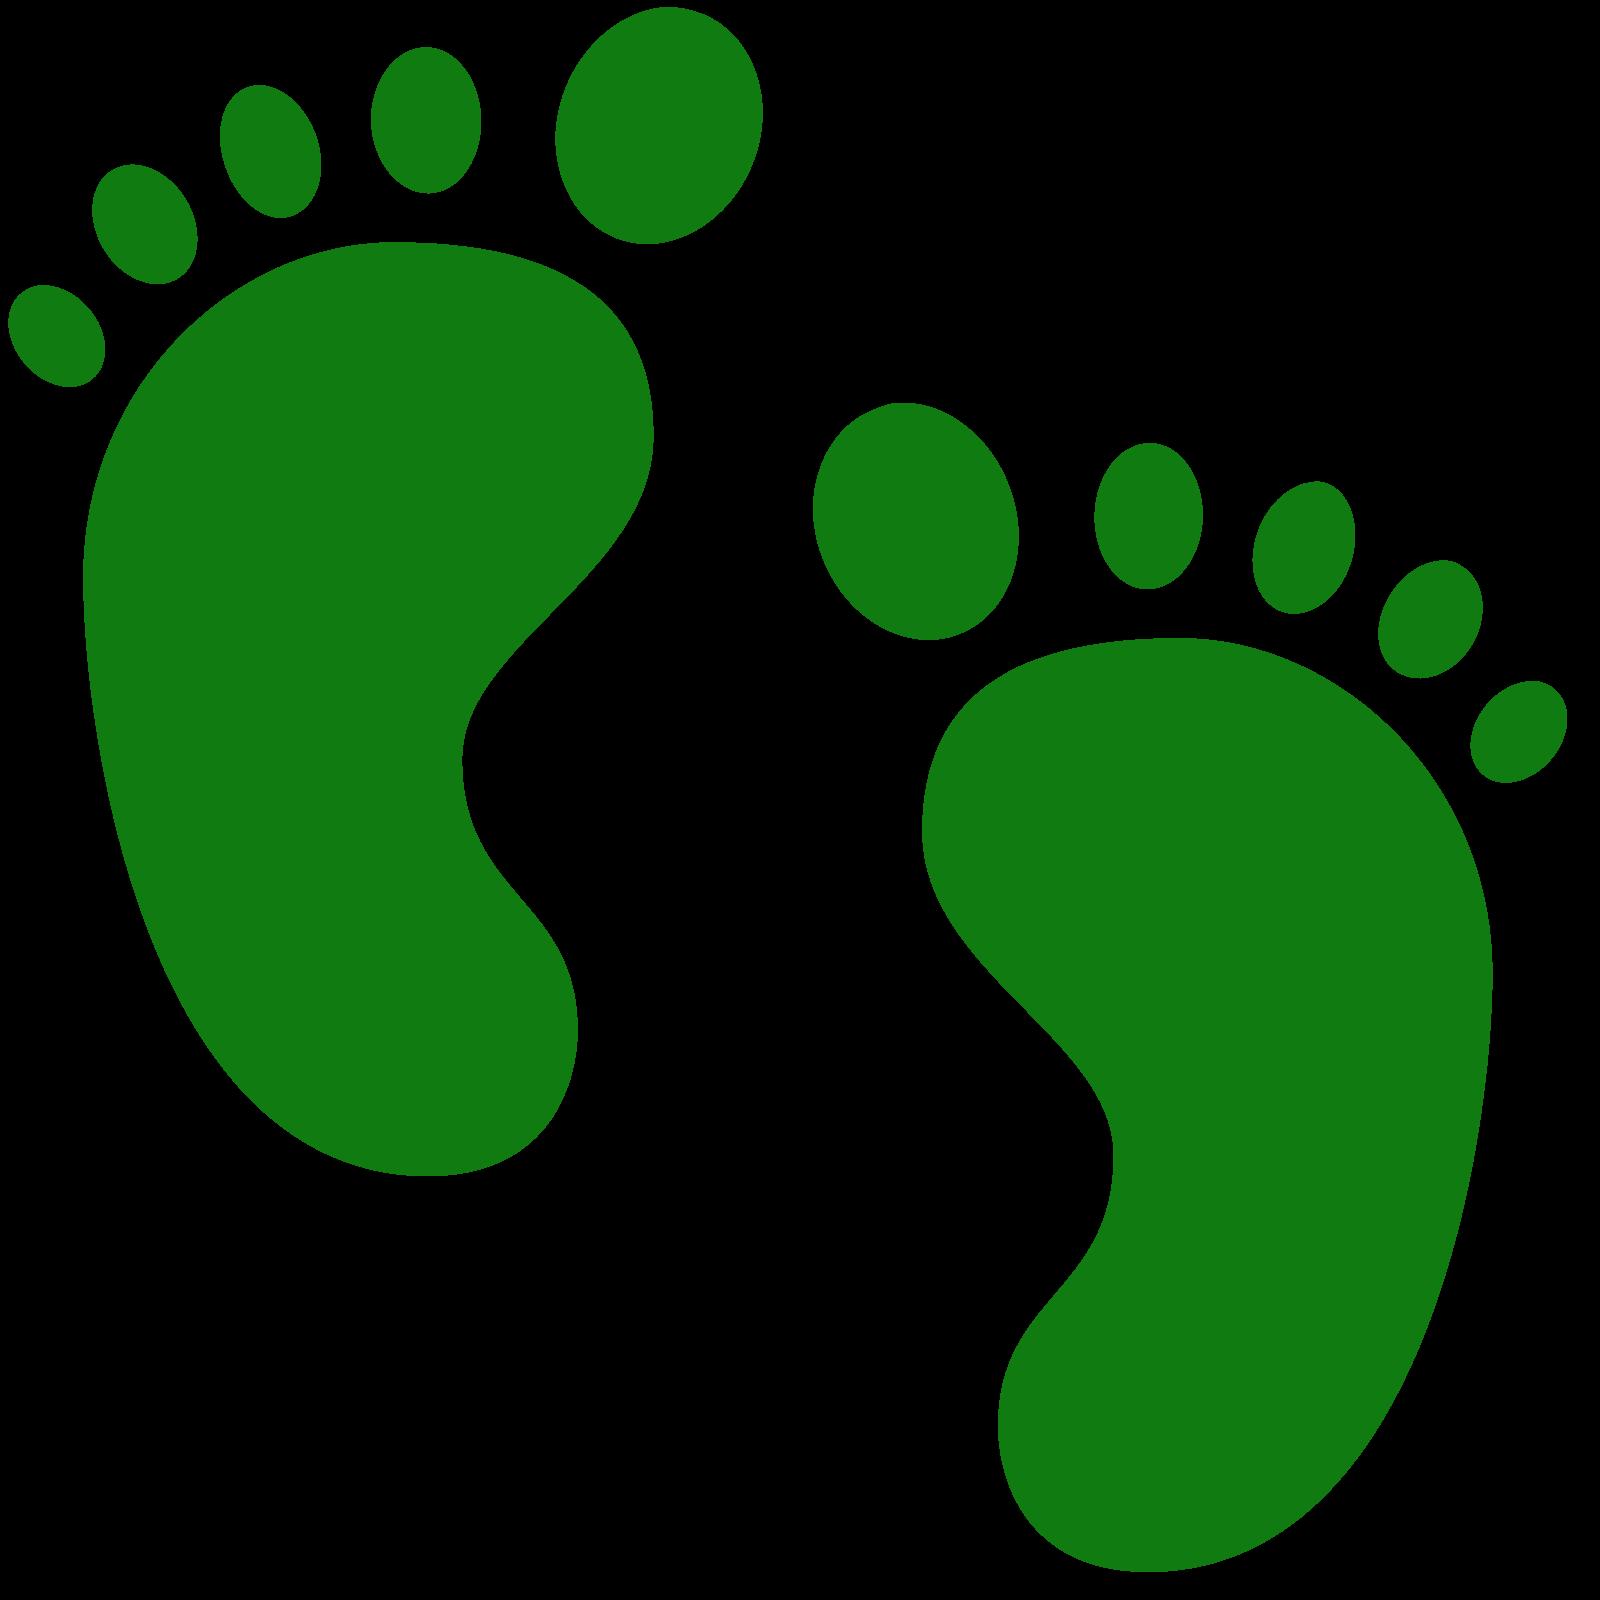 1600x1600 19 Feet Vector Baby Symbol Huge Freebie! Download For Powerpoint